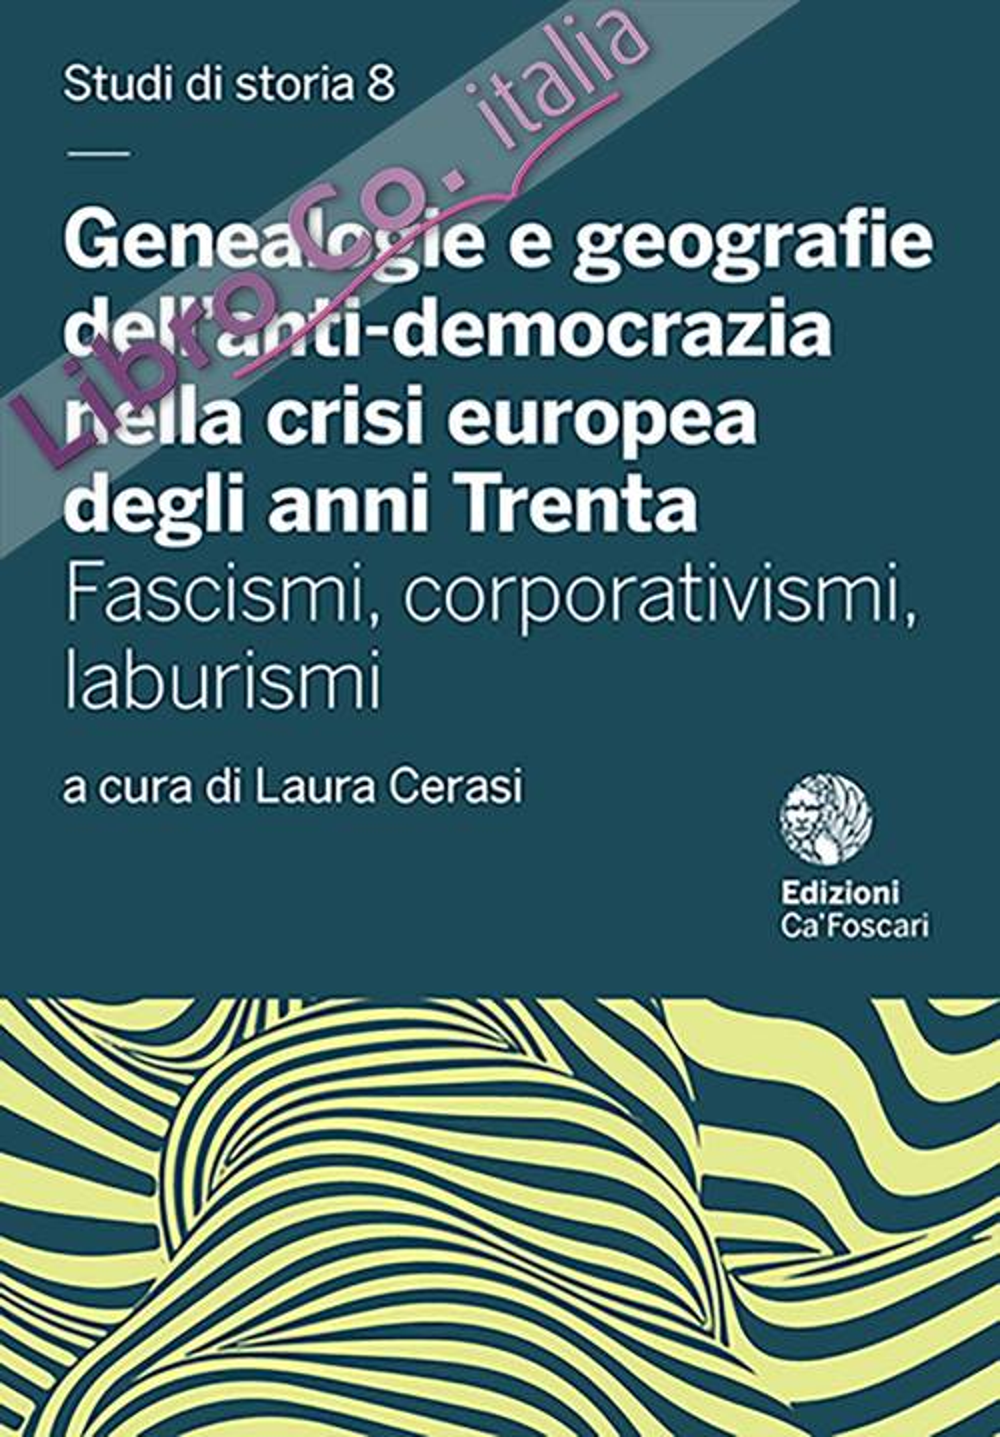 Genealogie e geografie dell'anti-democrazia nella crisi europea degli anni Trenta. Fascismi, corporativismi, laburismi